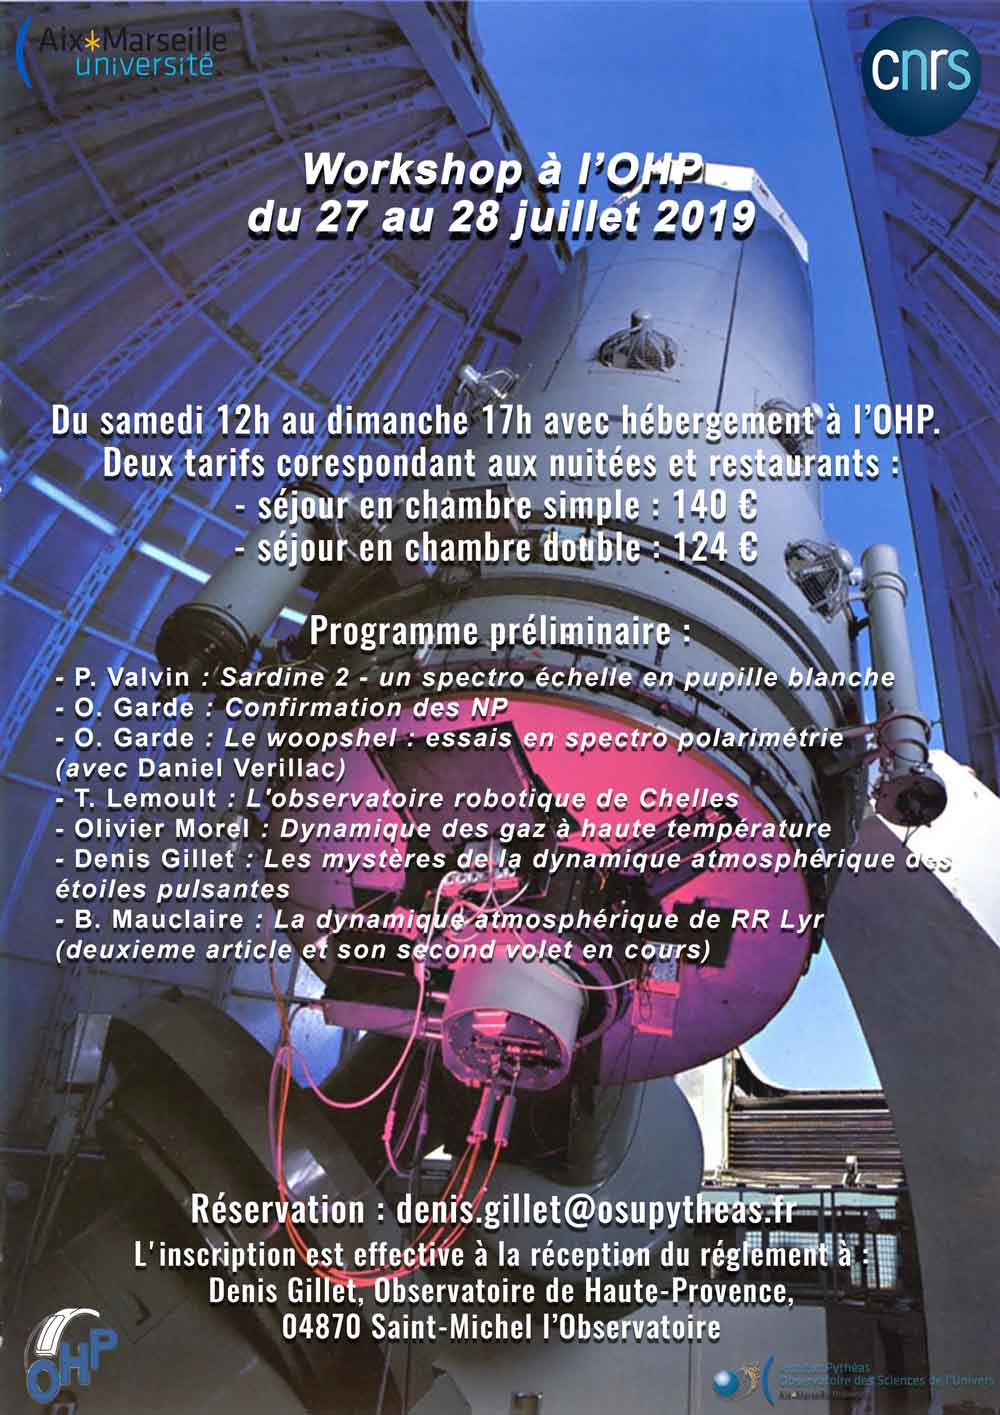 2019_workshop_GRRR_programmescsc.jpg.f035ced9593cd3e8e055563bb239d241.jpg